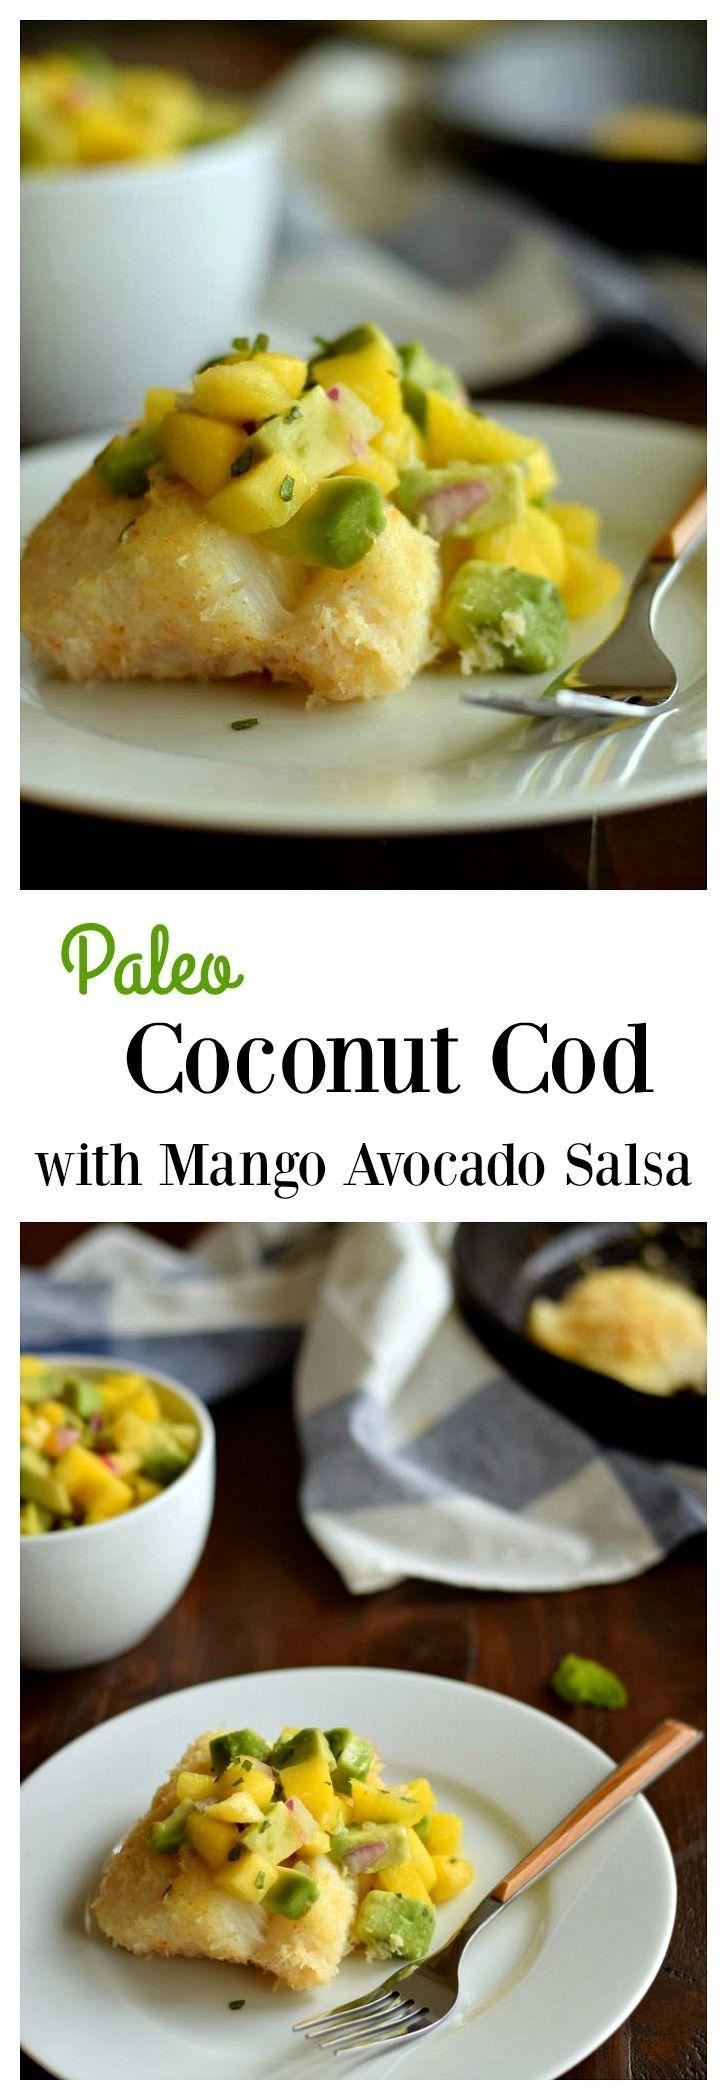 Healthy weeknight dinner- under 30 minutes! Coconut cod with mango avocado salsa.